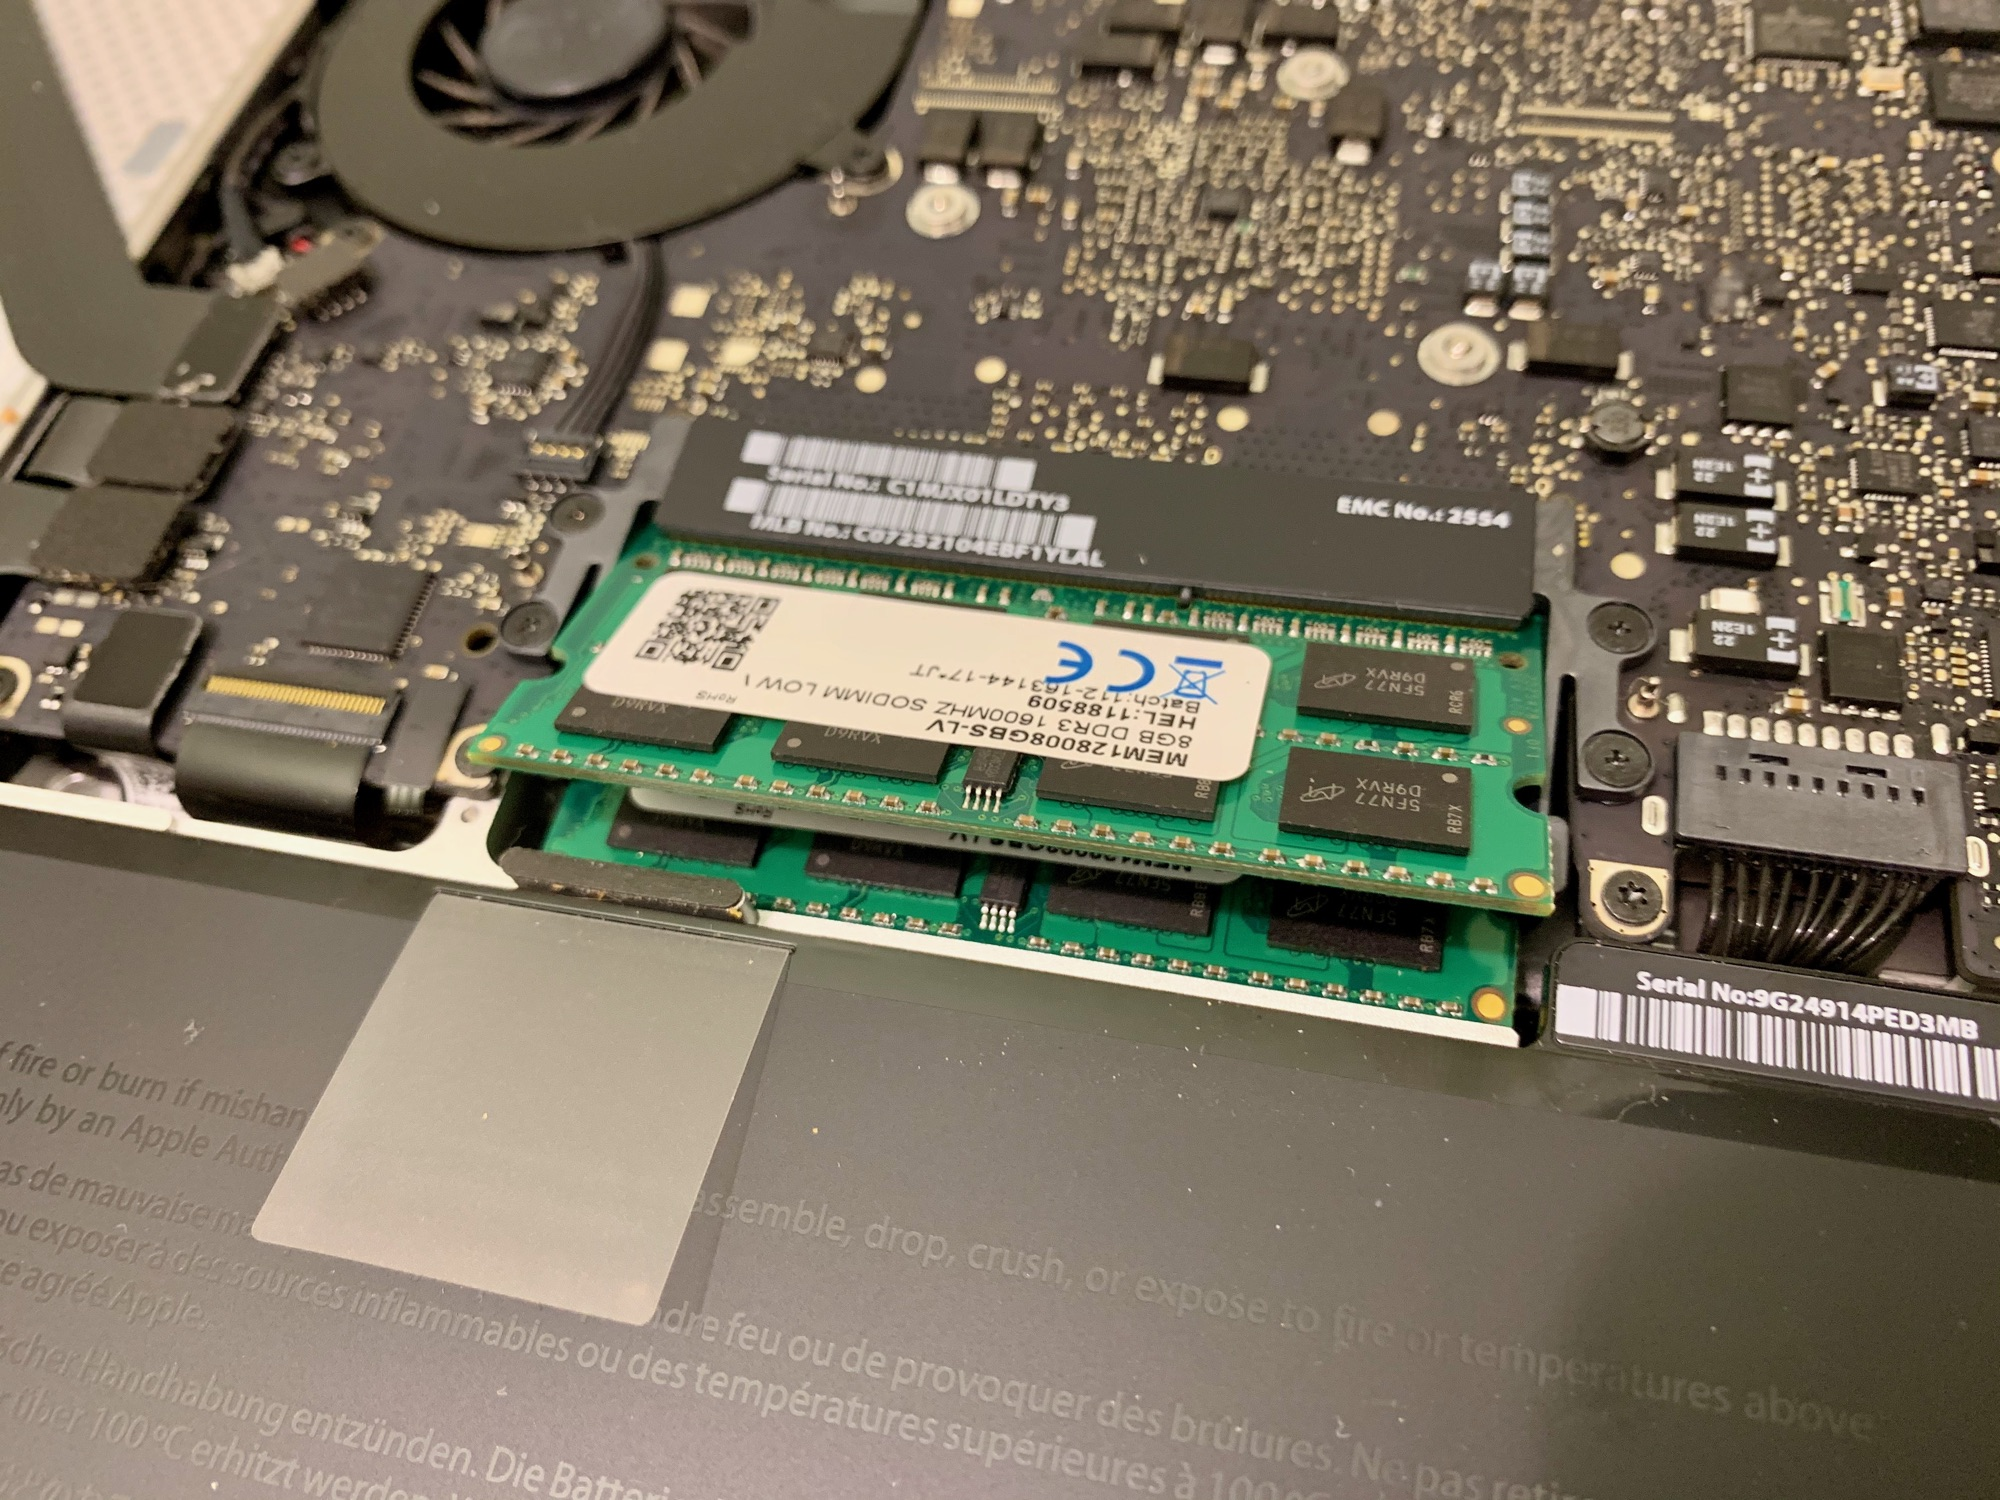 13-inch MacBook Pro RAM install